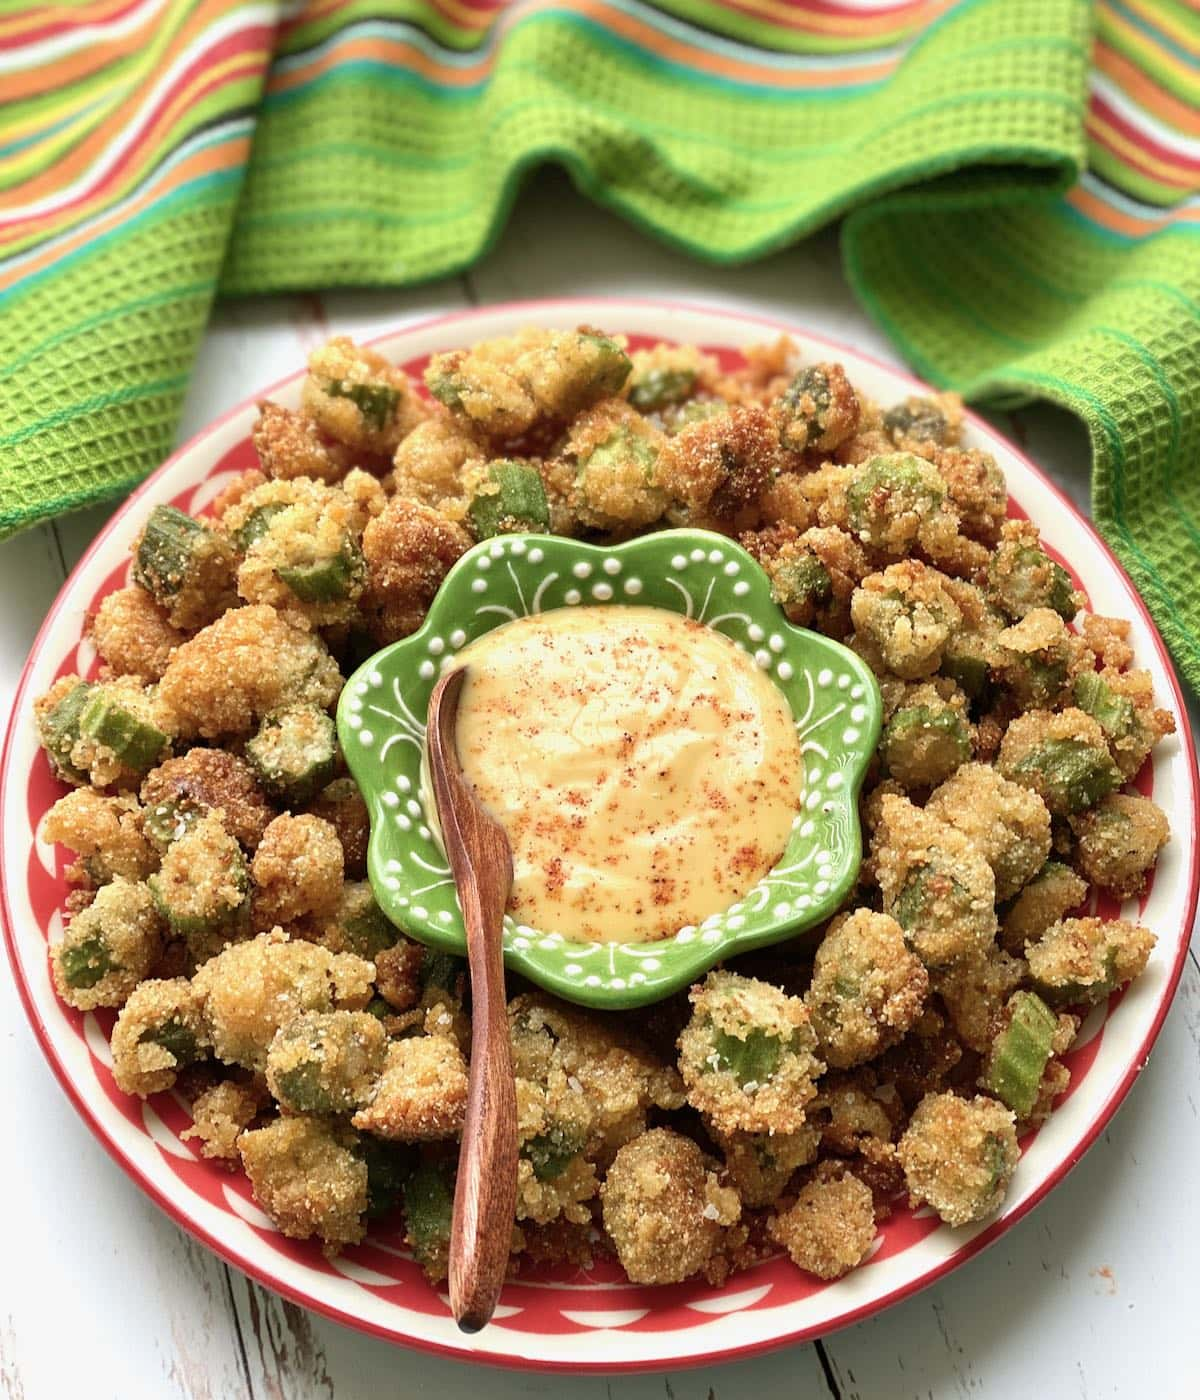 fried okra surrounding a green dish of honey mustard sauce.